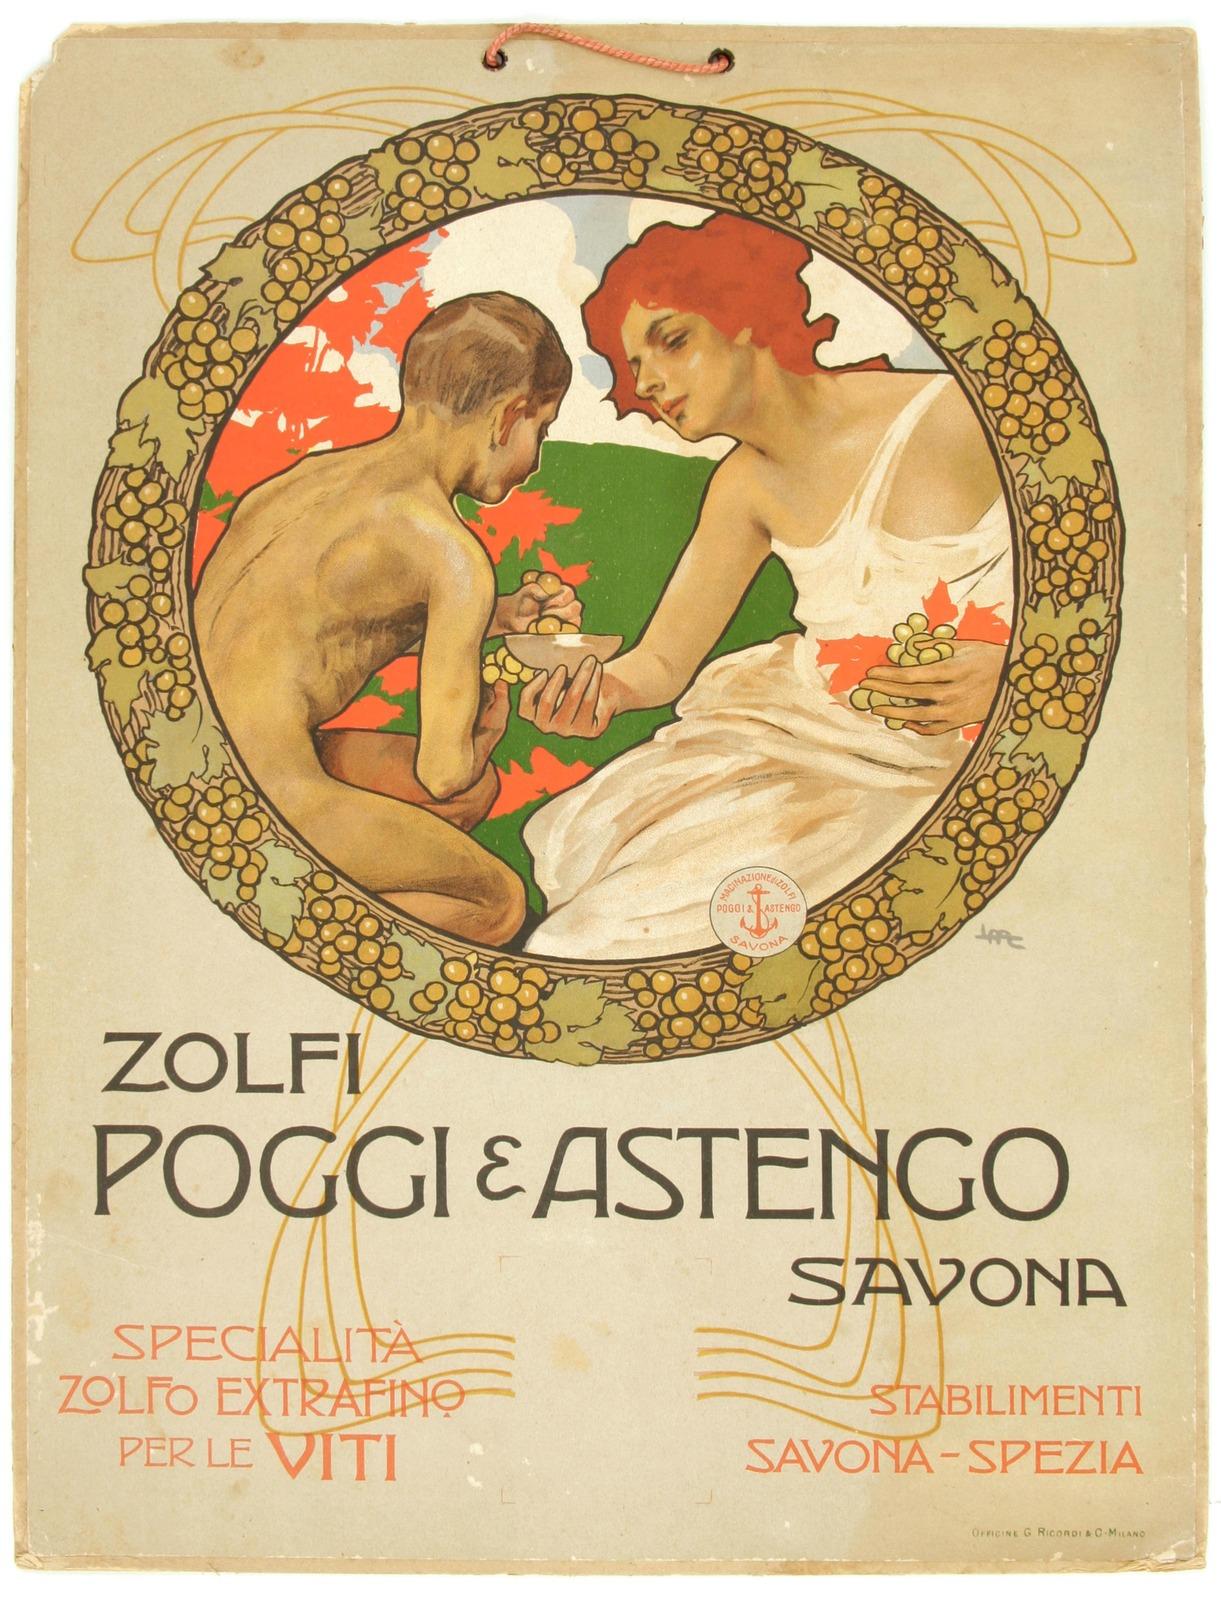 1930_Zolfi Poggi & Astengo_39.6 х 25.5_цветная литография.jpg